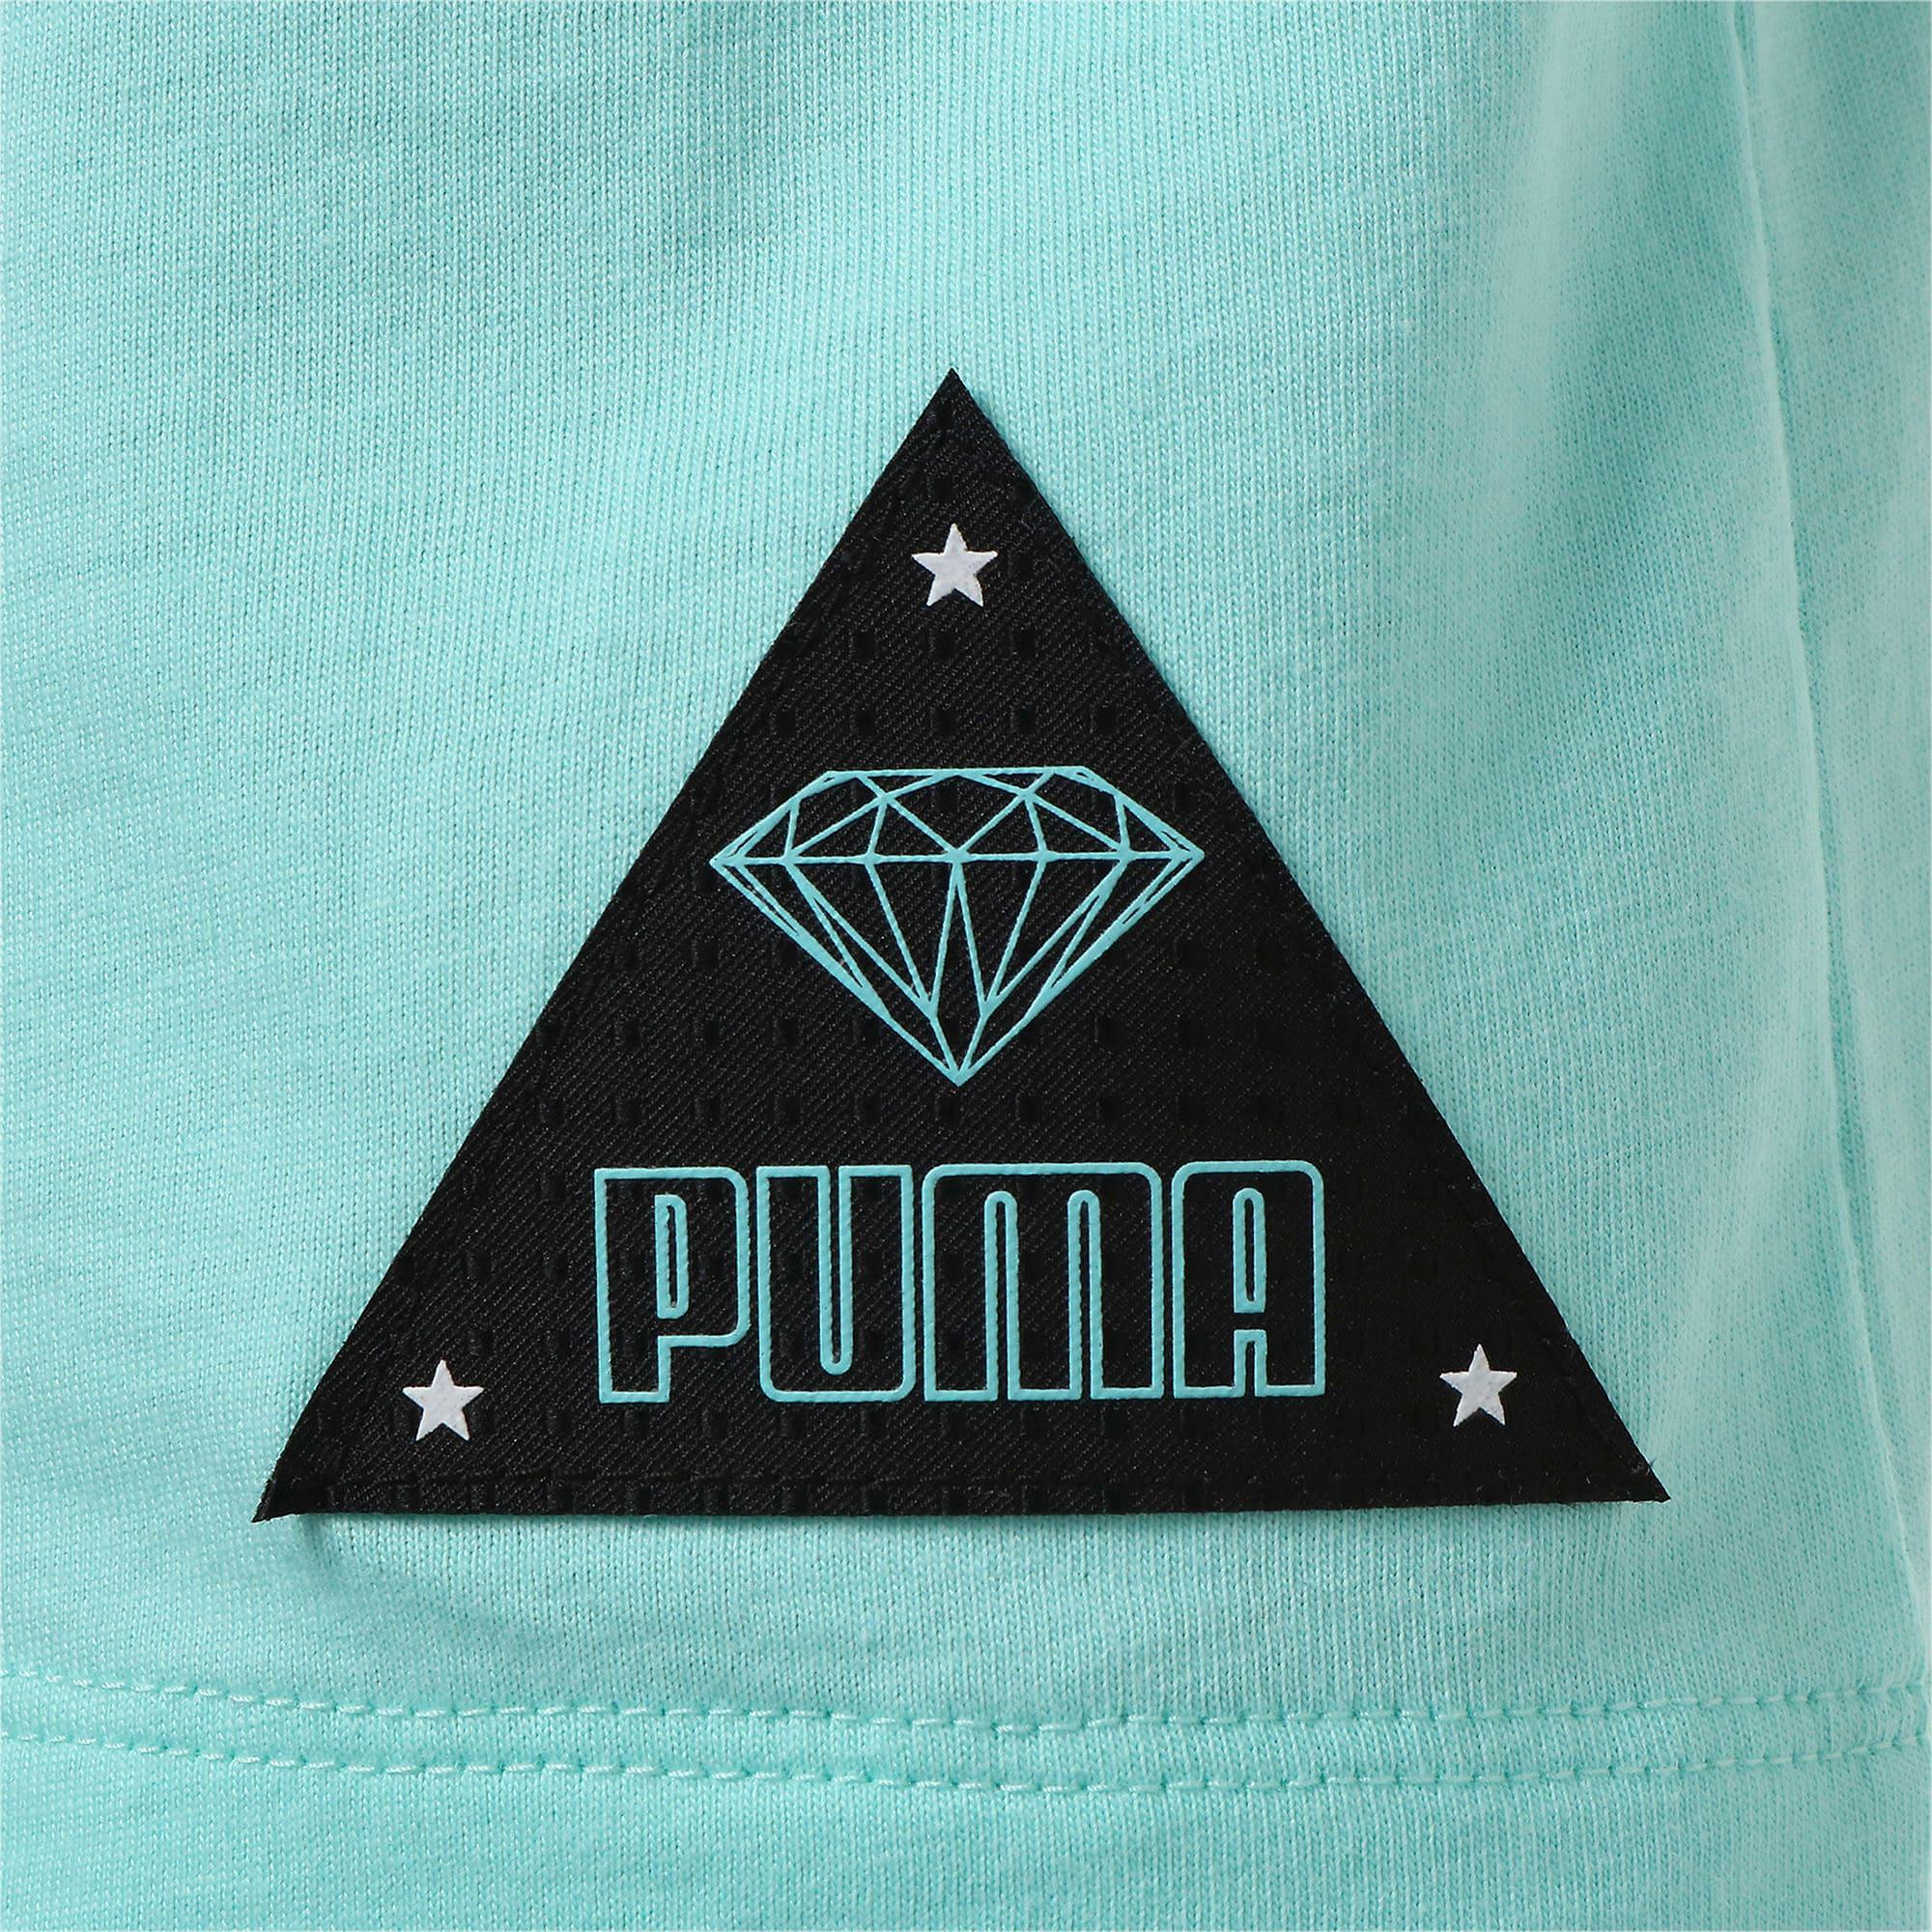 Thumbnail 4 of キッズ PUMA x DIAMOND Tシャツ, ARUBA BLUE, medium-JPN